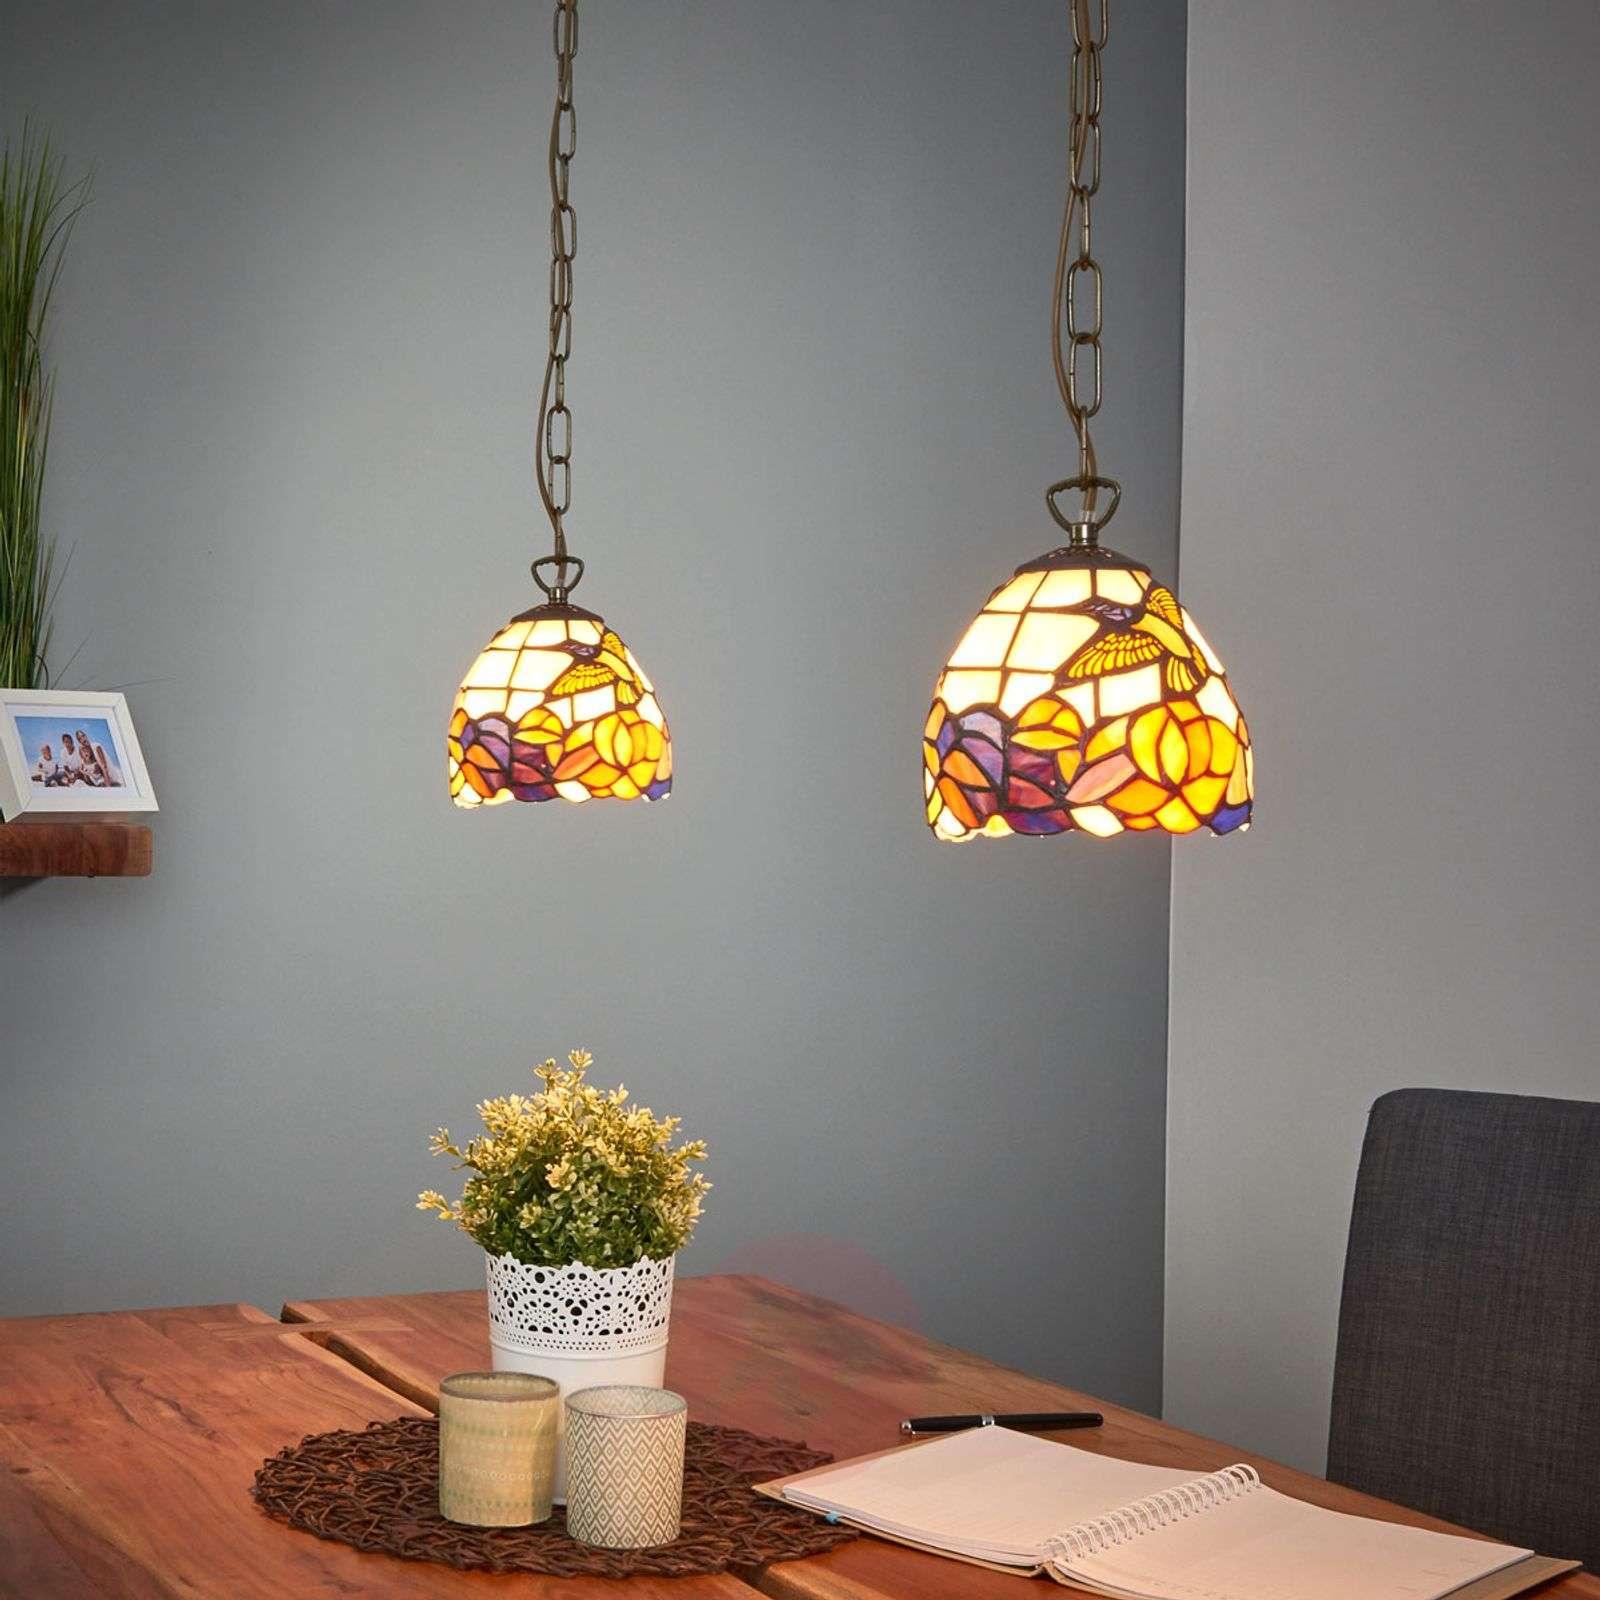 Tiffany-style hanging light COLIBRI-1032064-01